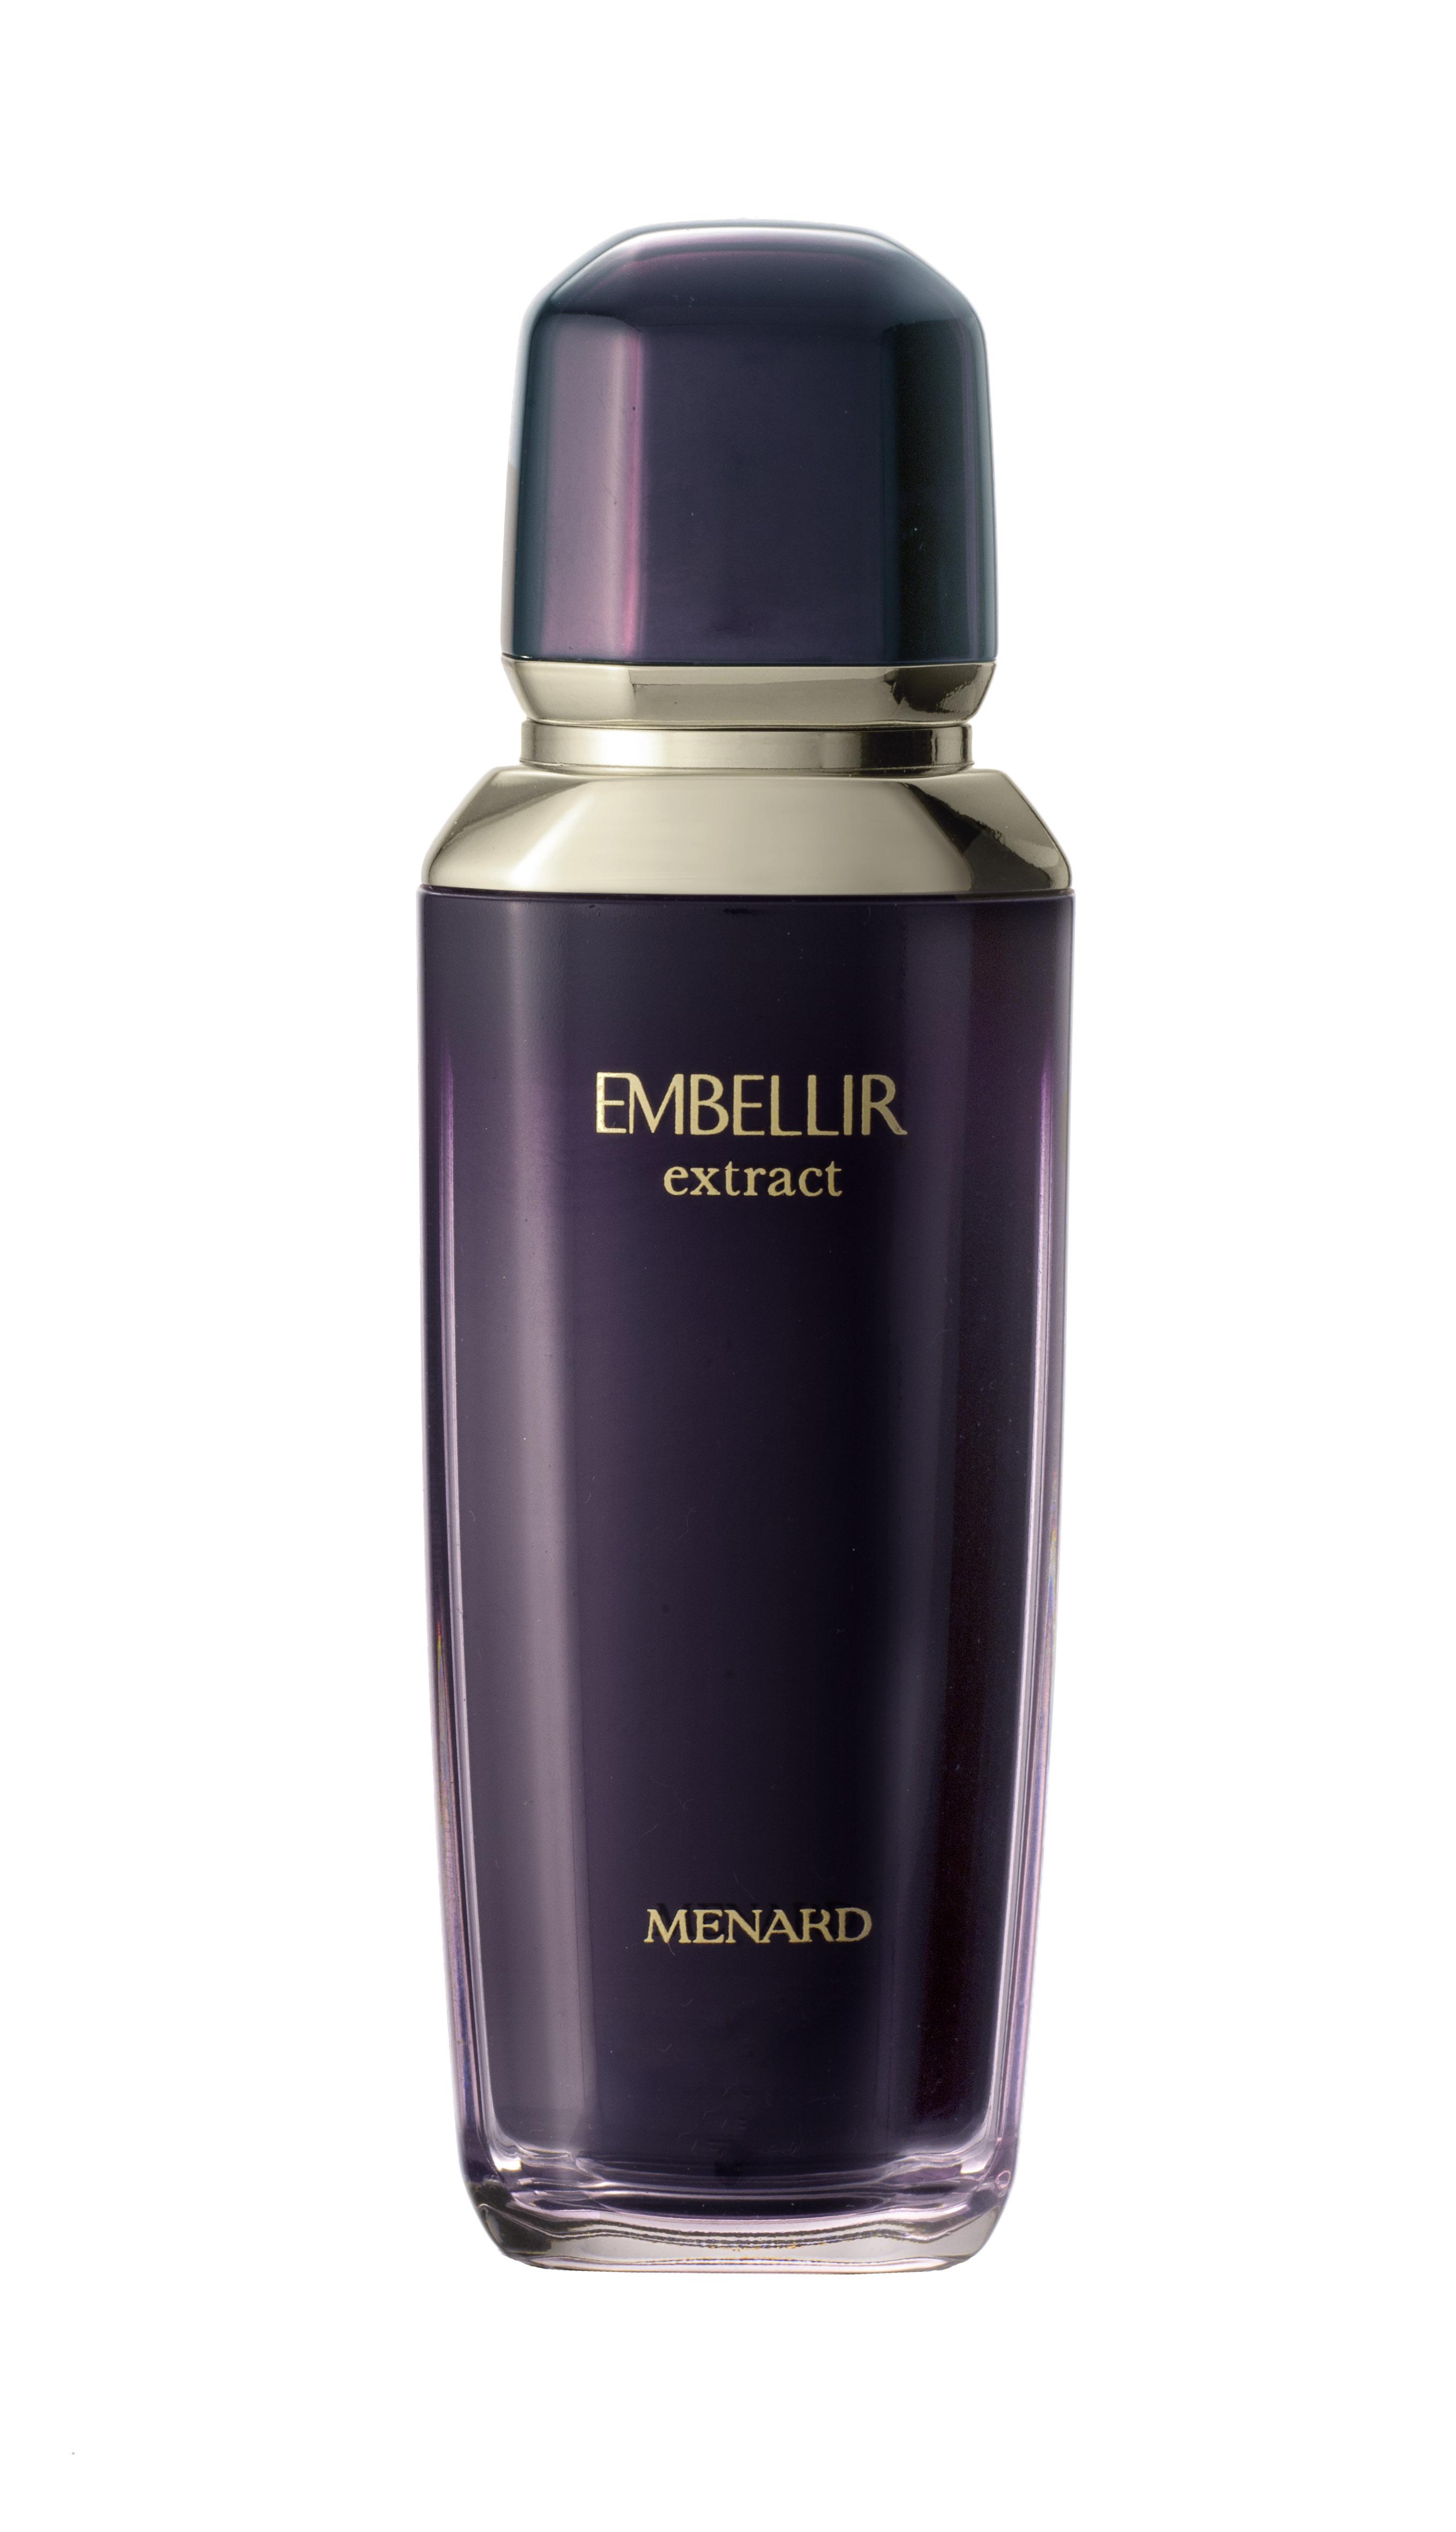 Menard - Embellir Extract